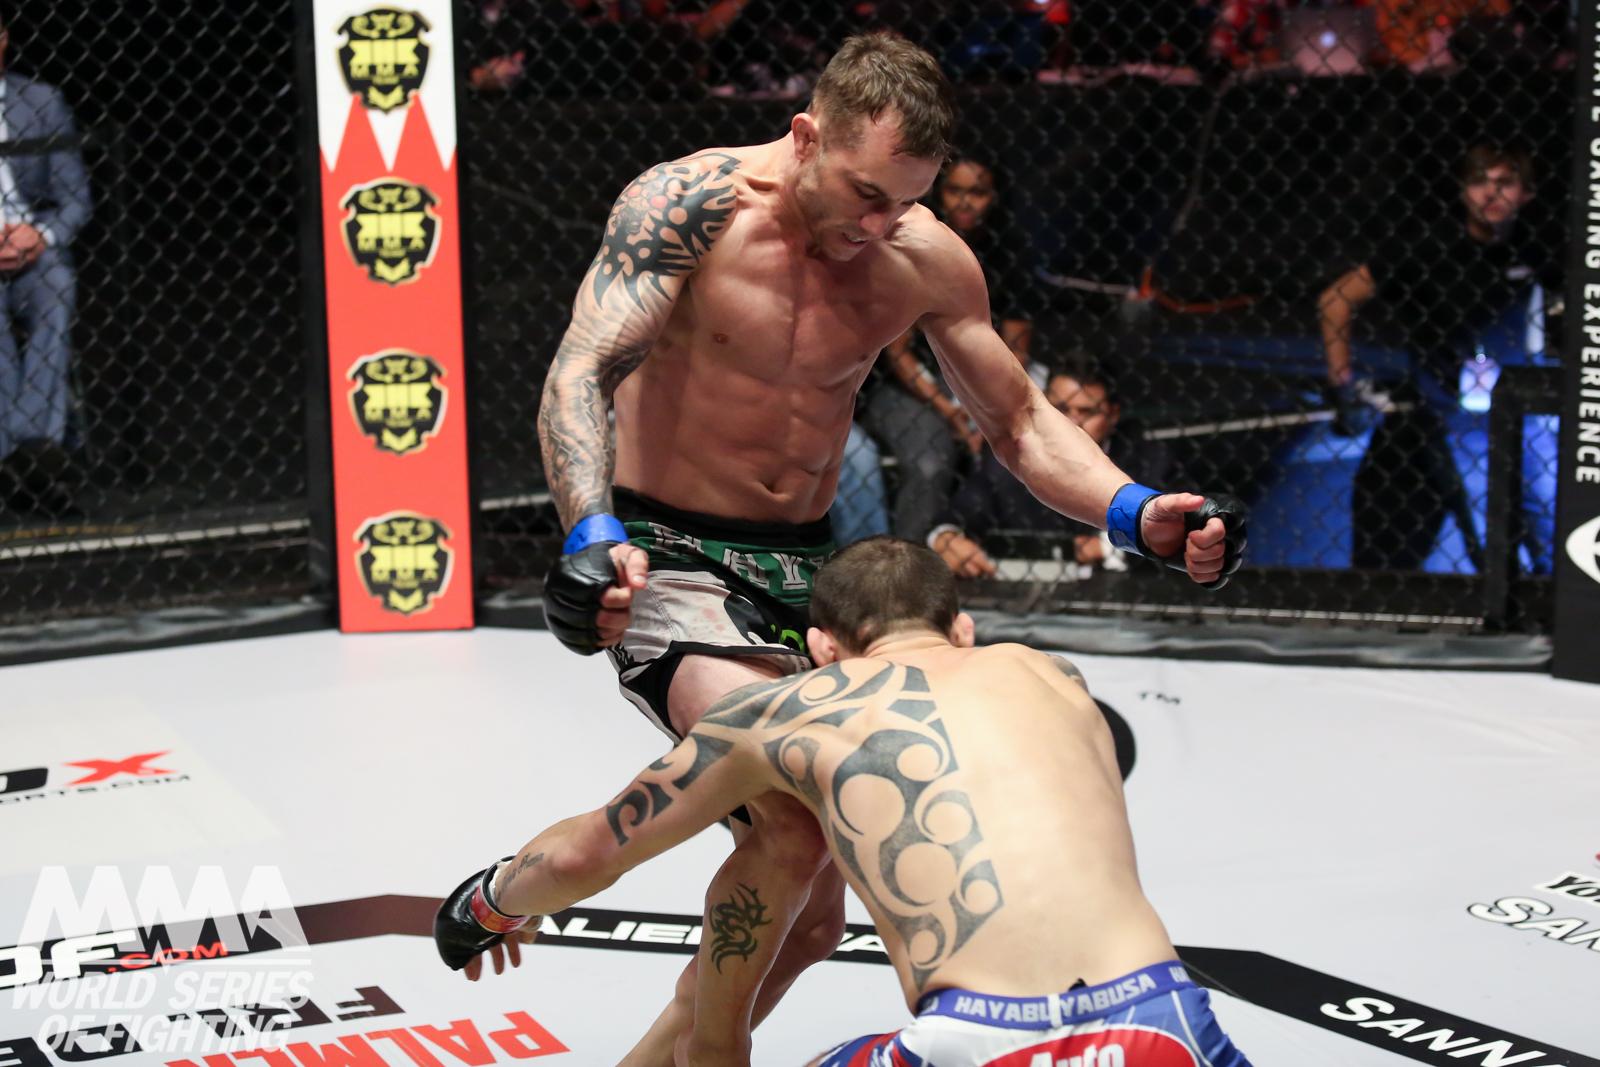 MMA_WSOF29_JustinGaethje_BrianFoster